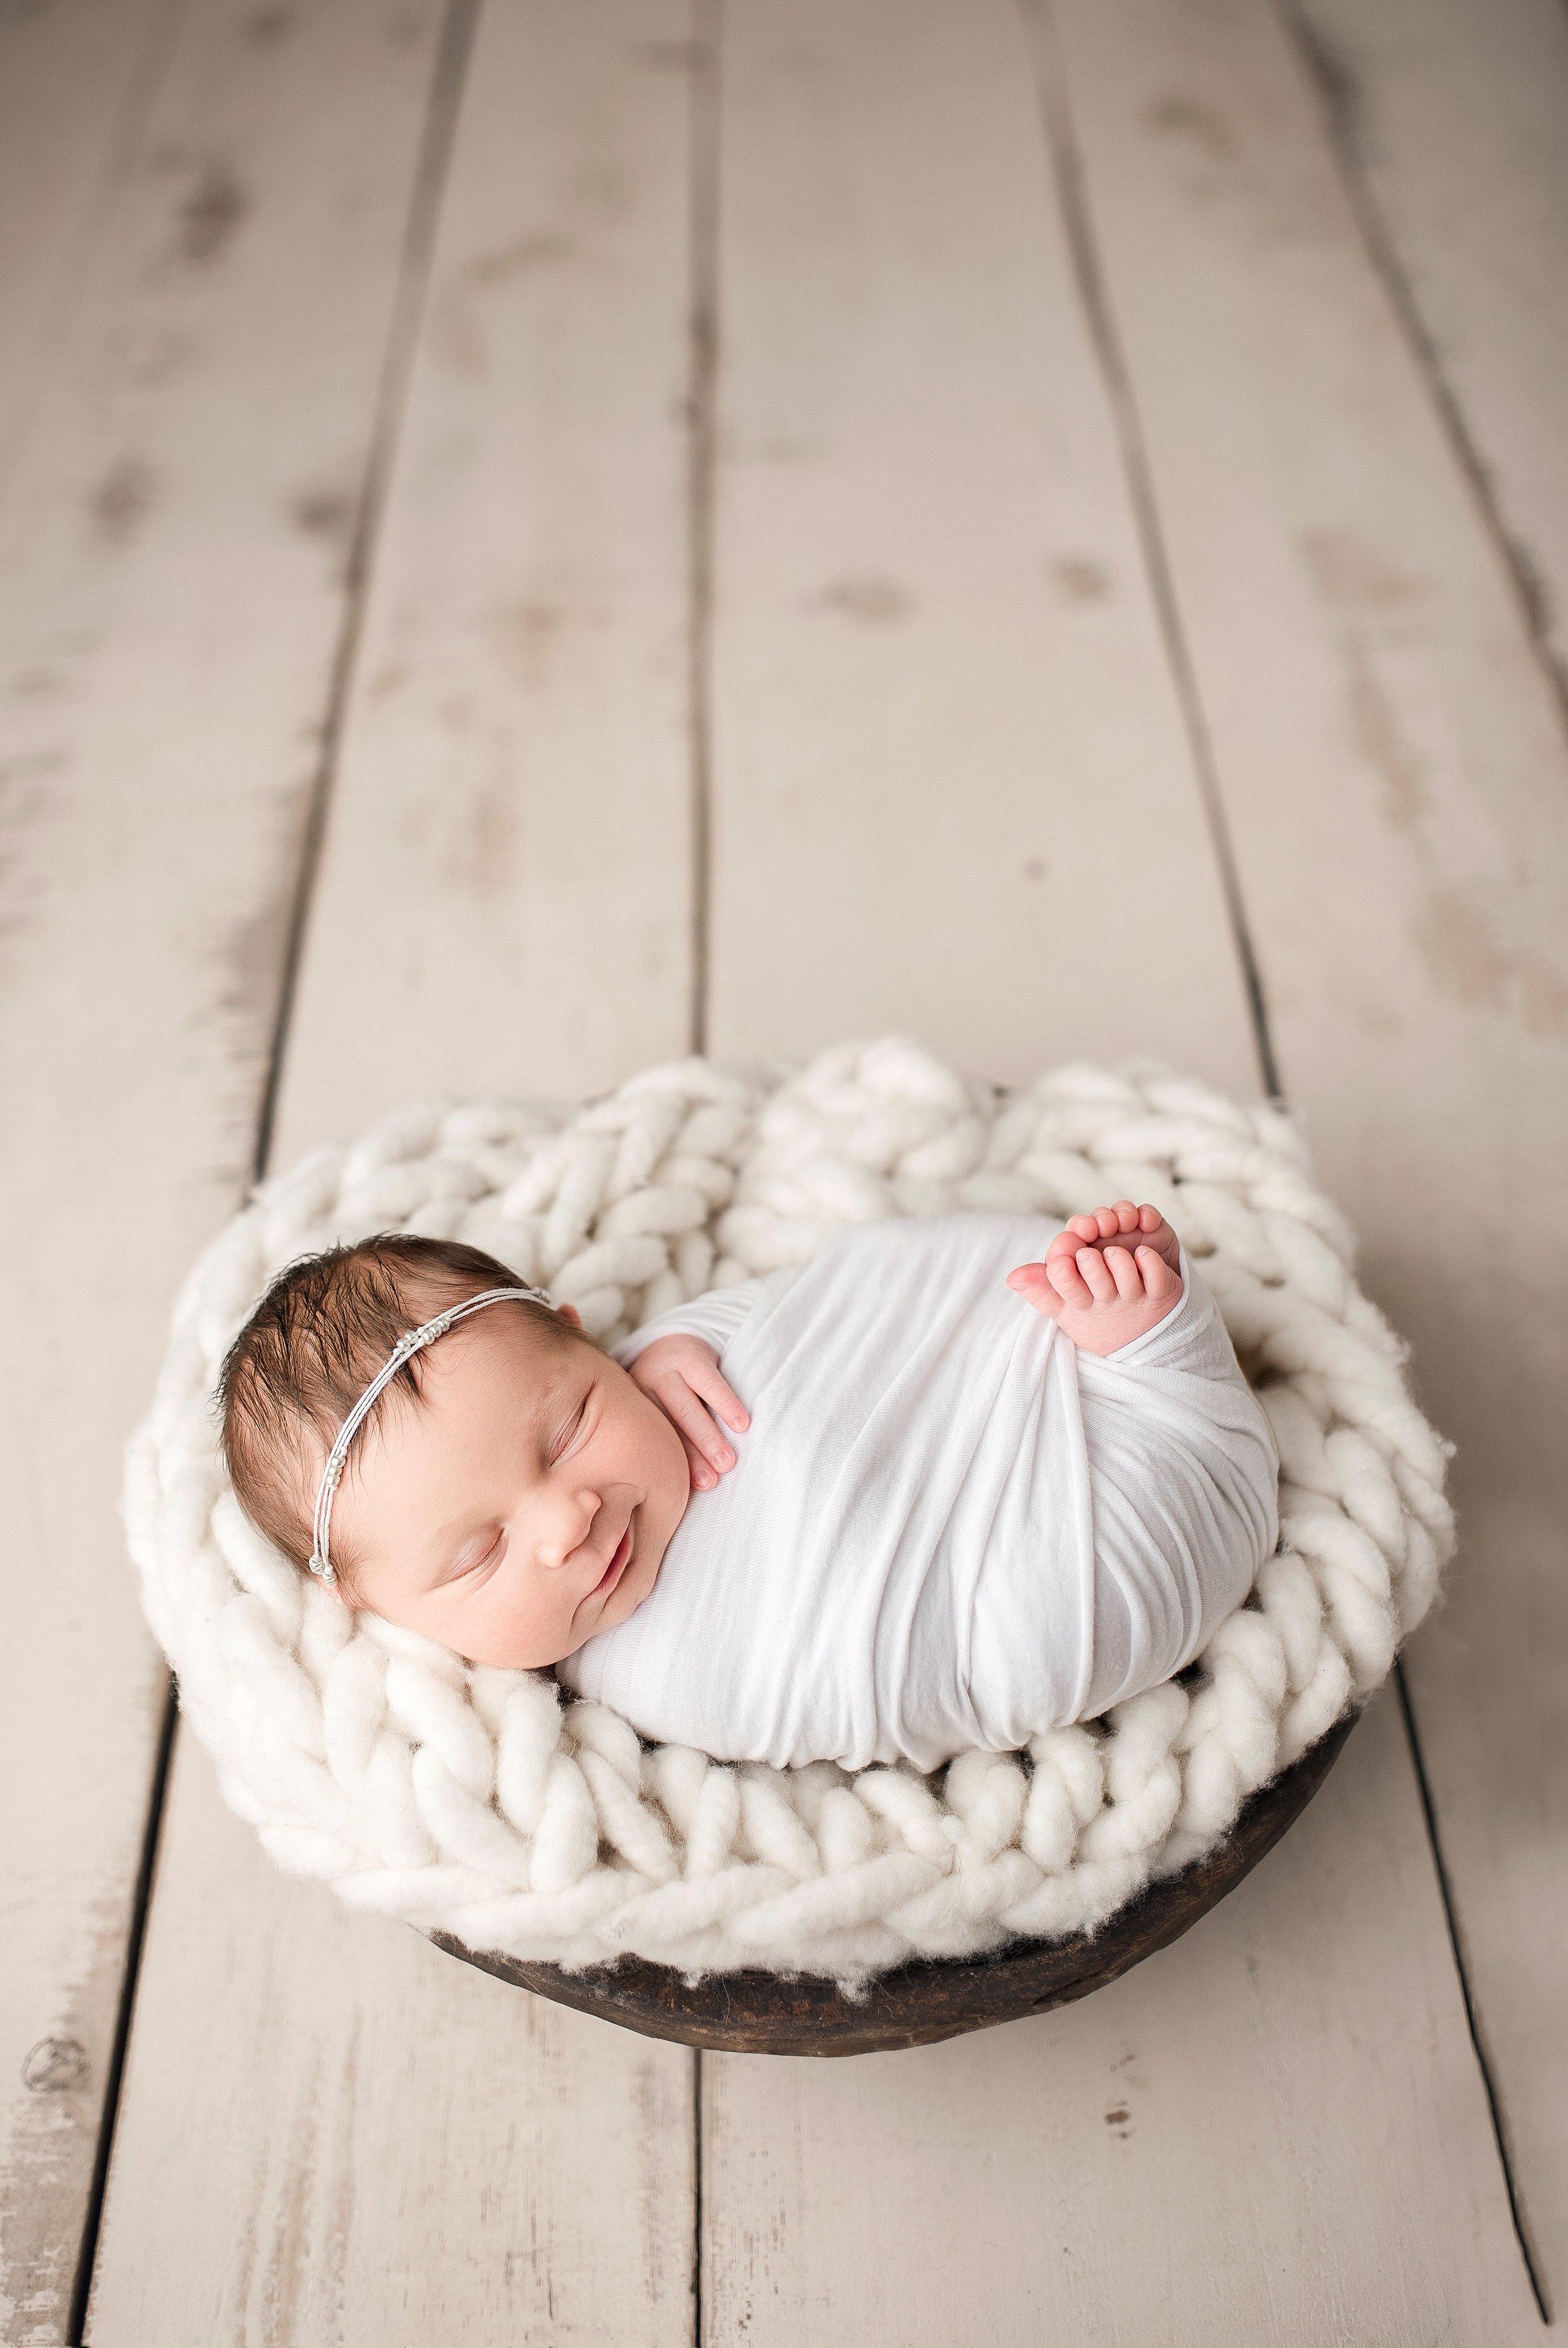 newborn photography editing